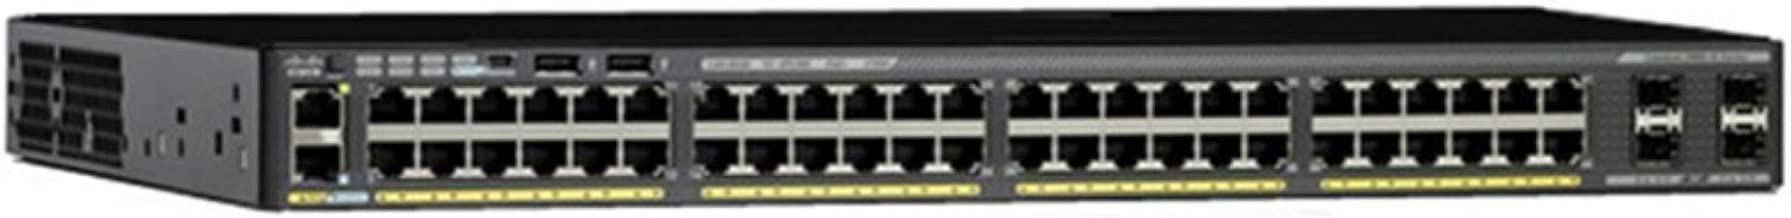 Cisco WS-C2960X-48FPD-L Catalyst 2960-x 48 GigE PoE 740W 2 x 10G Switch